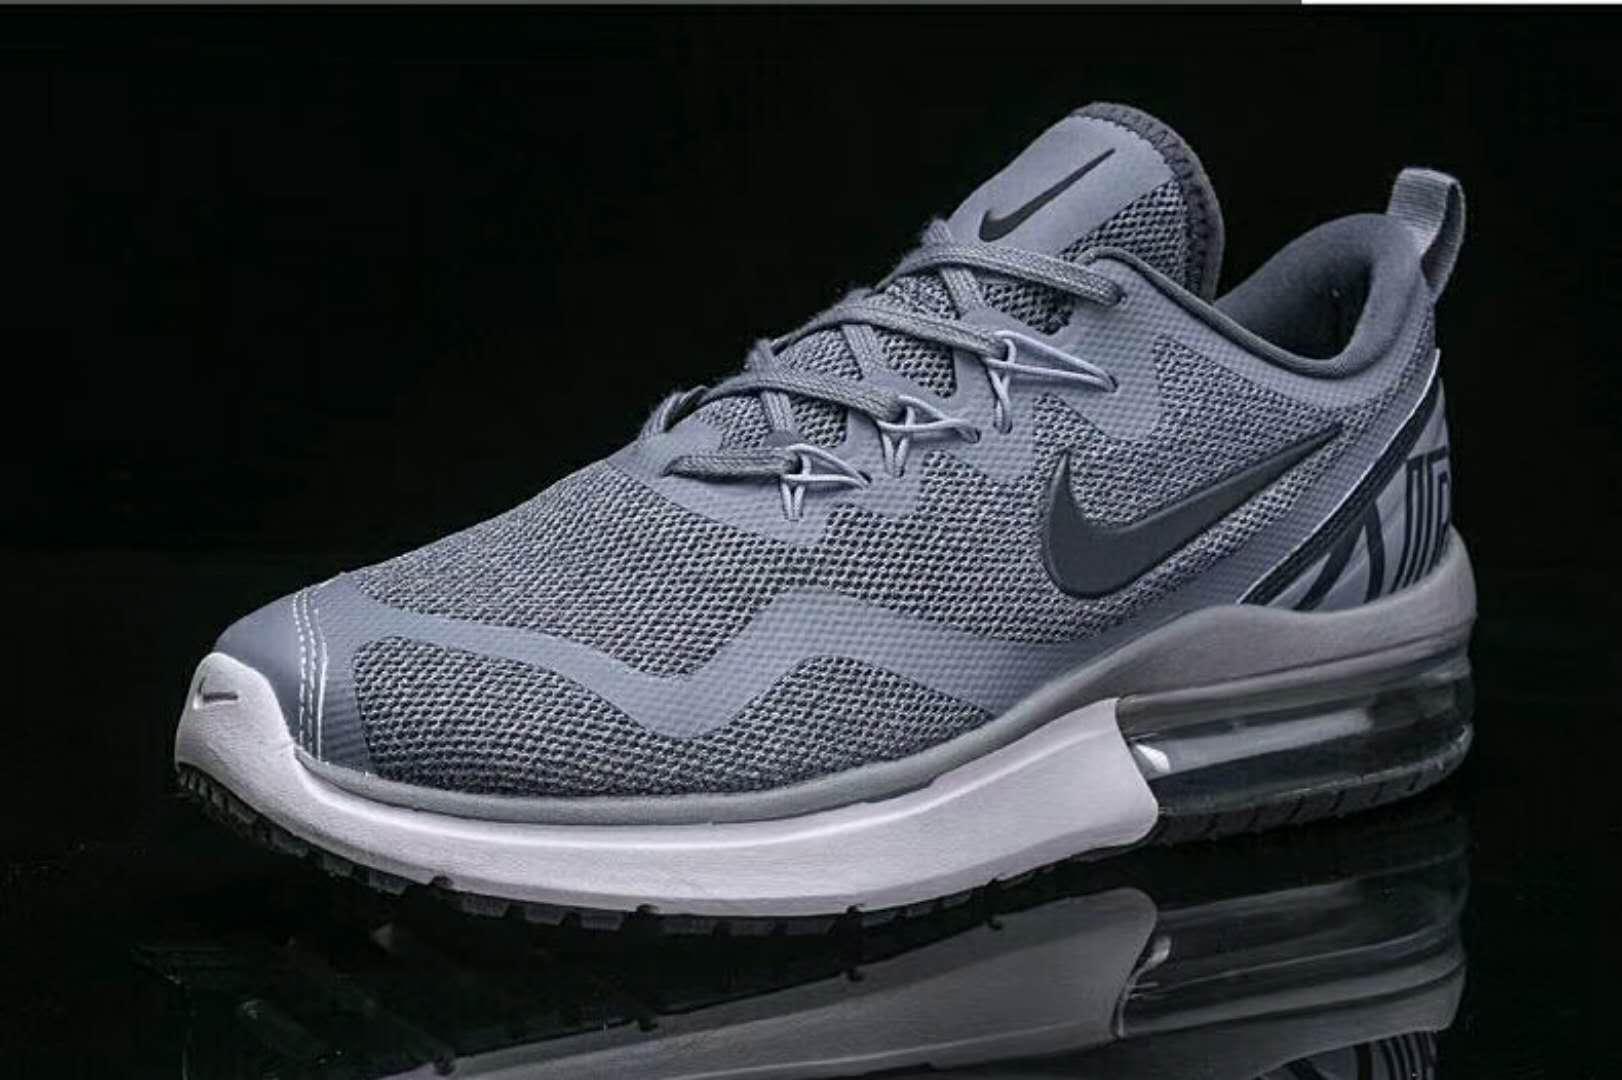 44131cd7cdab Prev Nike Air Max FURY Running Shoes Wolf Grey White. Zoom